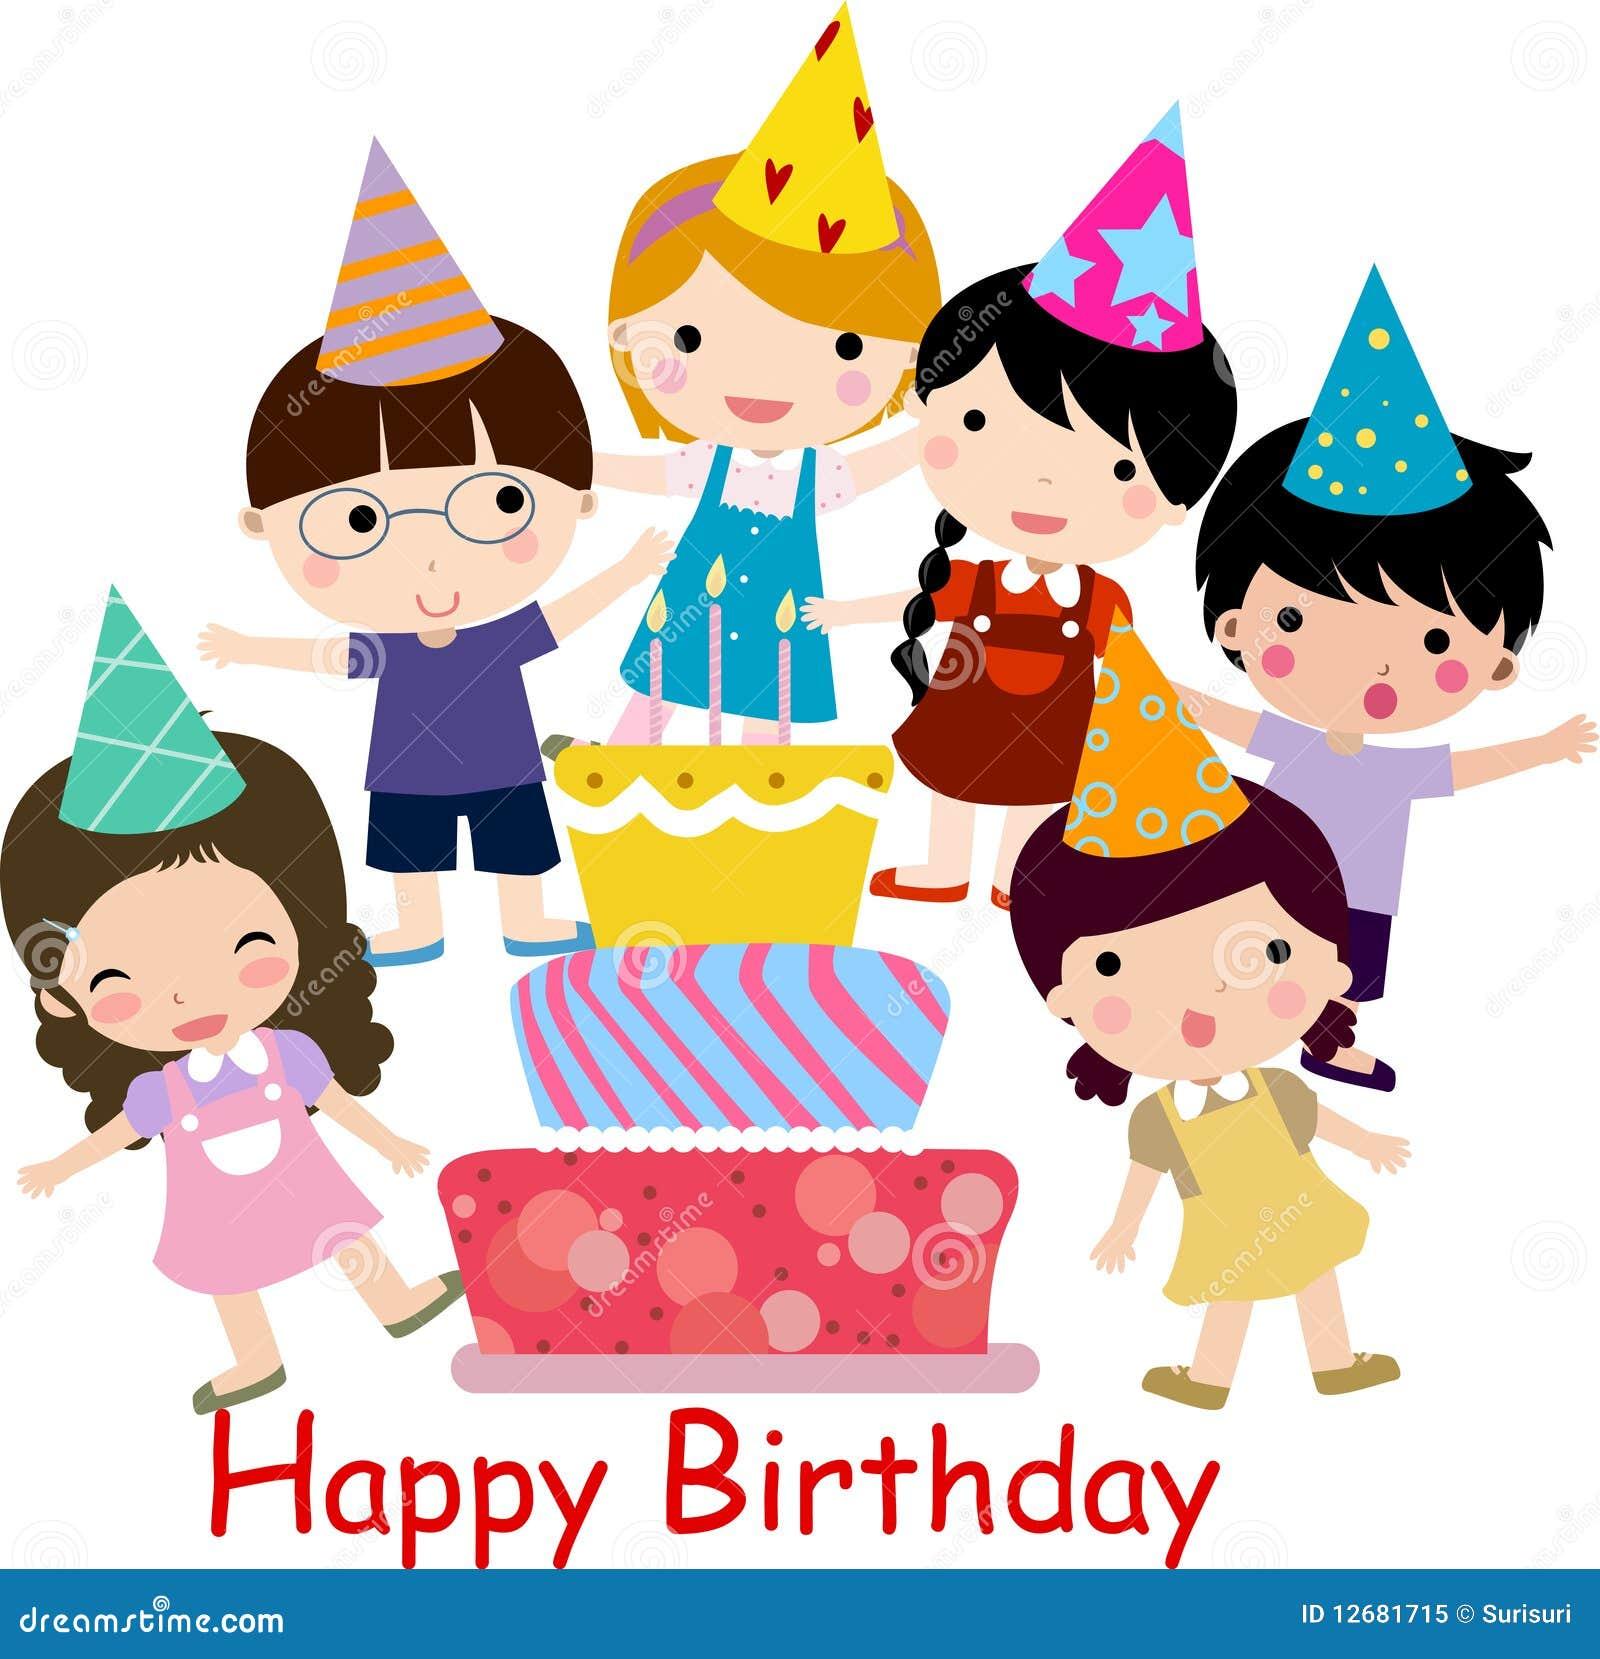 Birthday Celebration Royalty Free Stock Photo Image